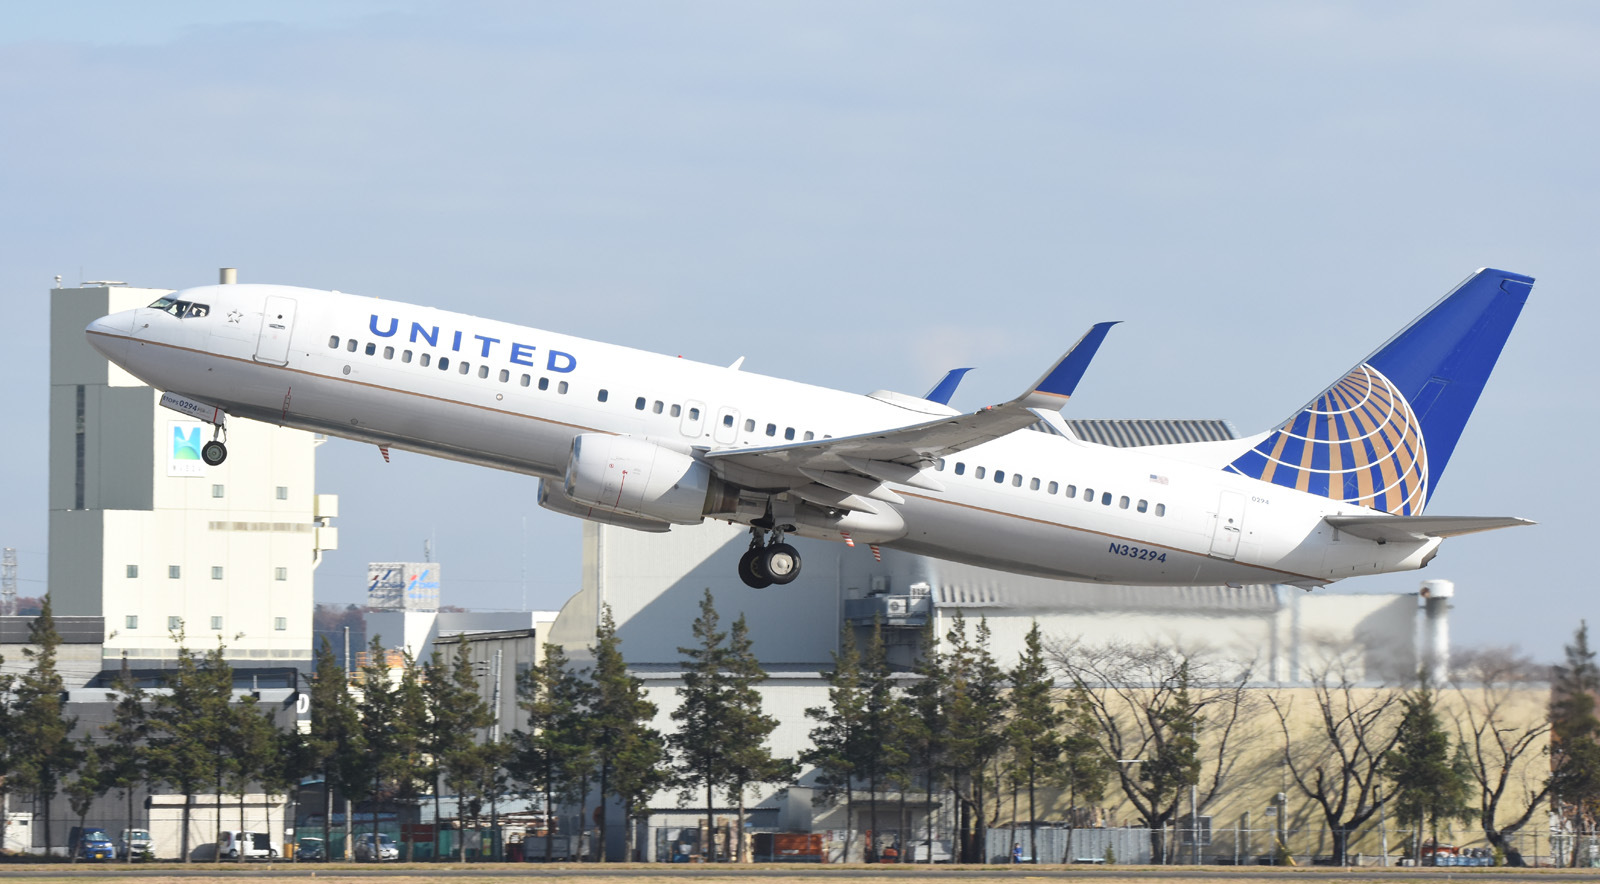 United161207g473